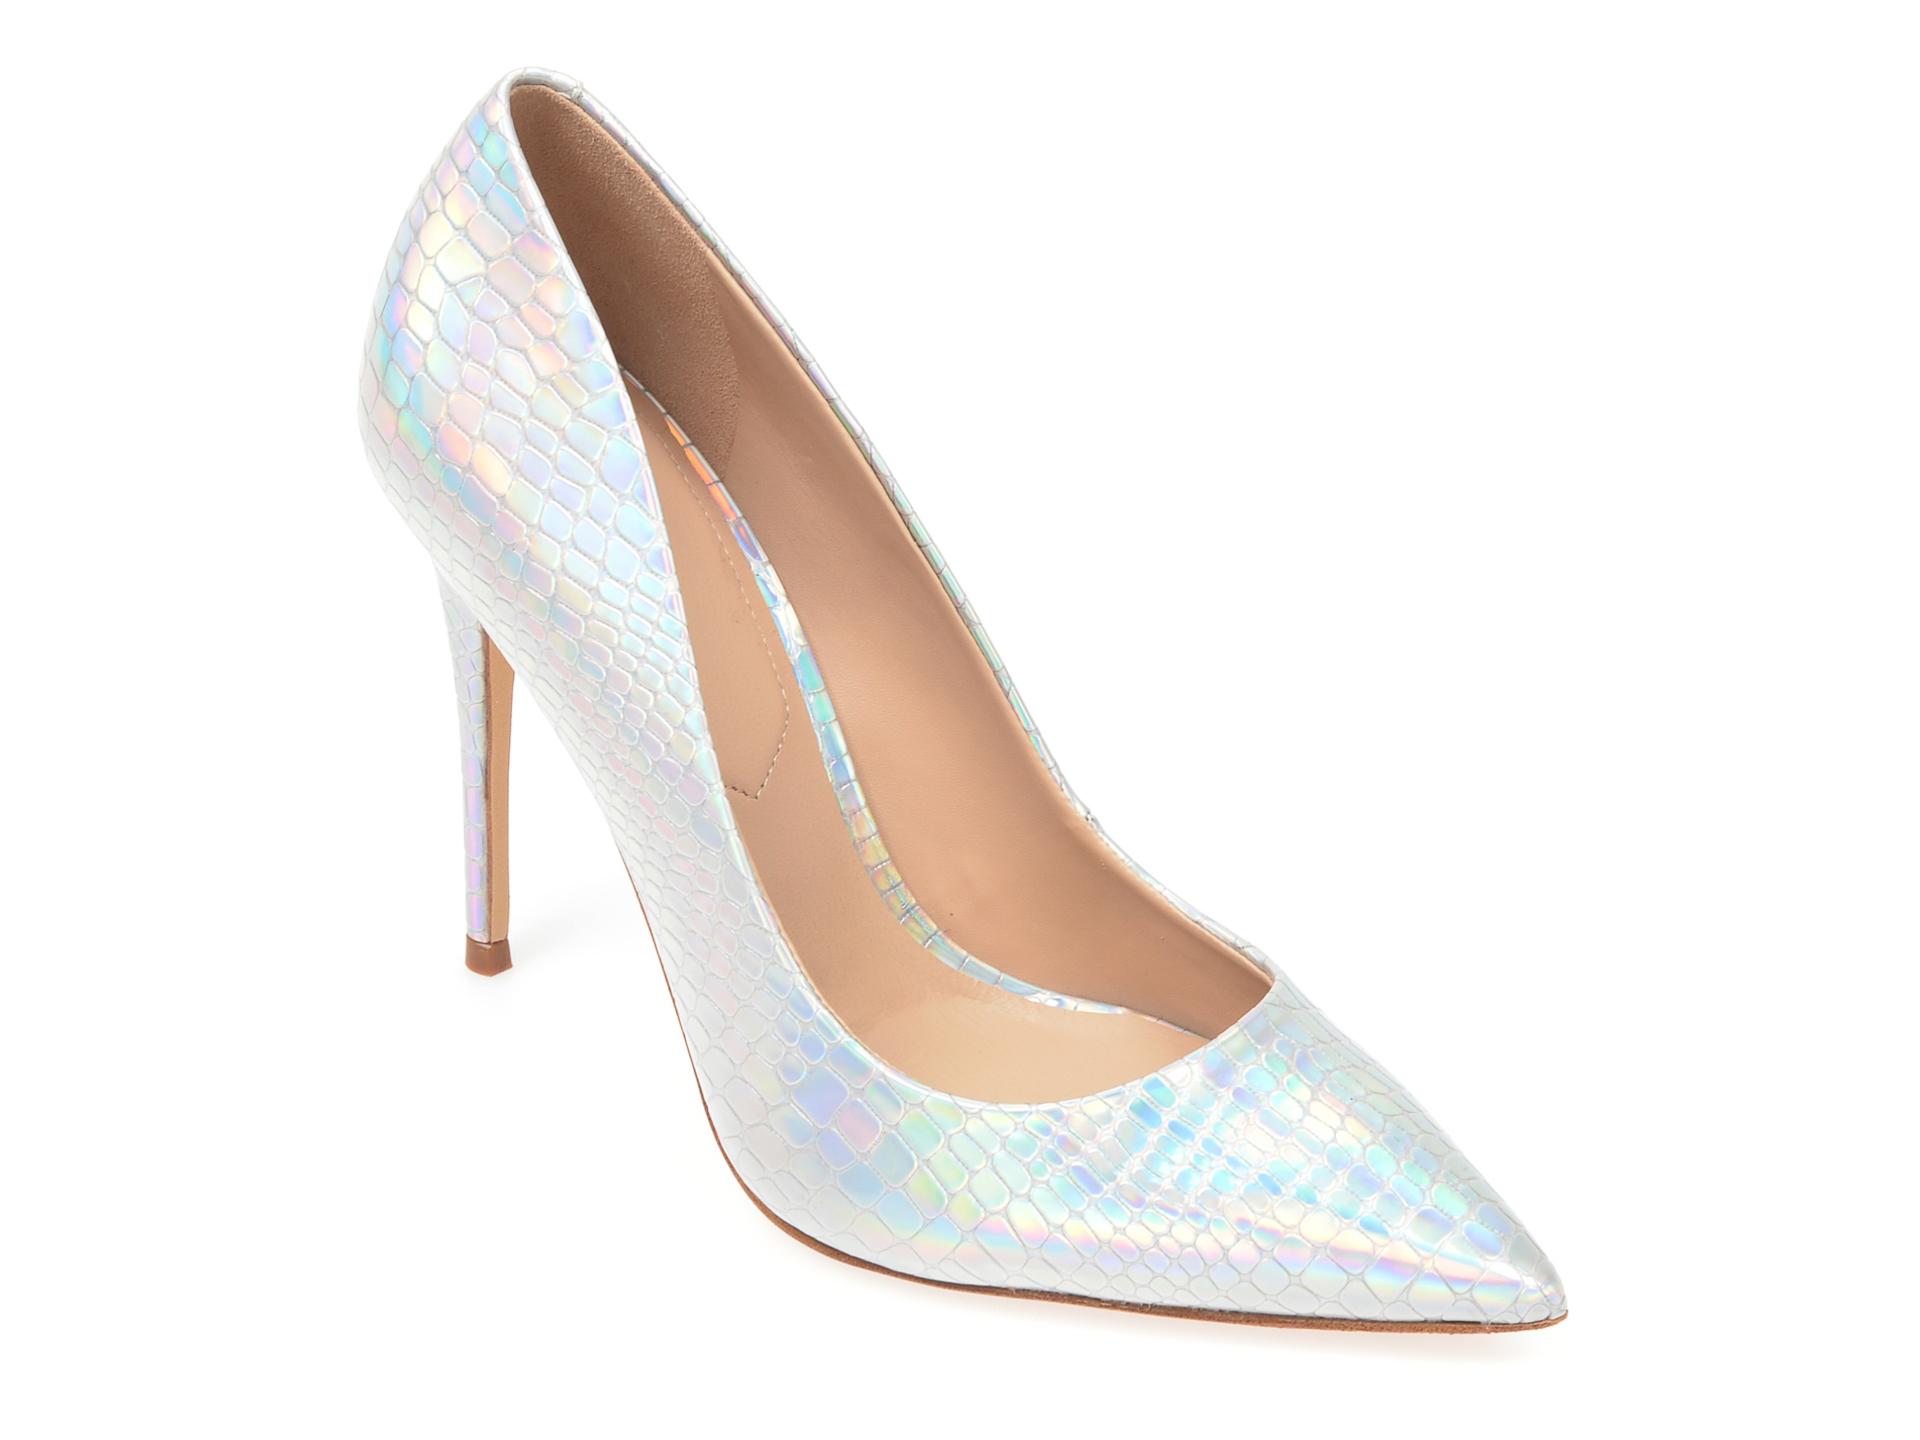 Pantofi ALDO argintii, Stessy_042, din piele ecologica imagine otter.ro 2021